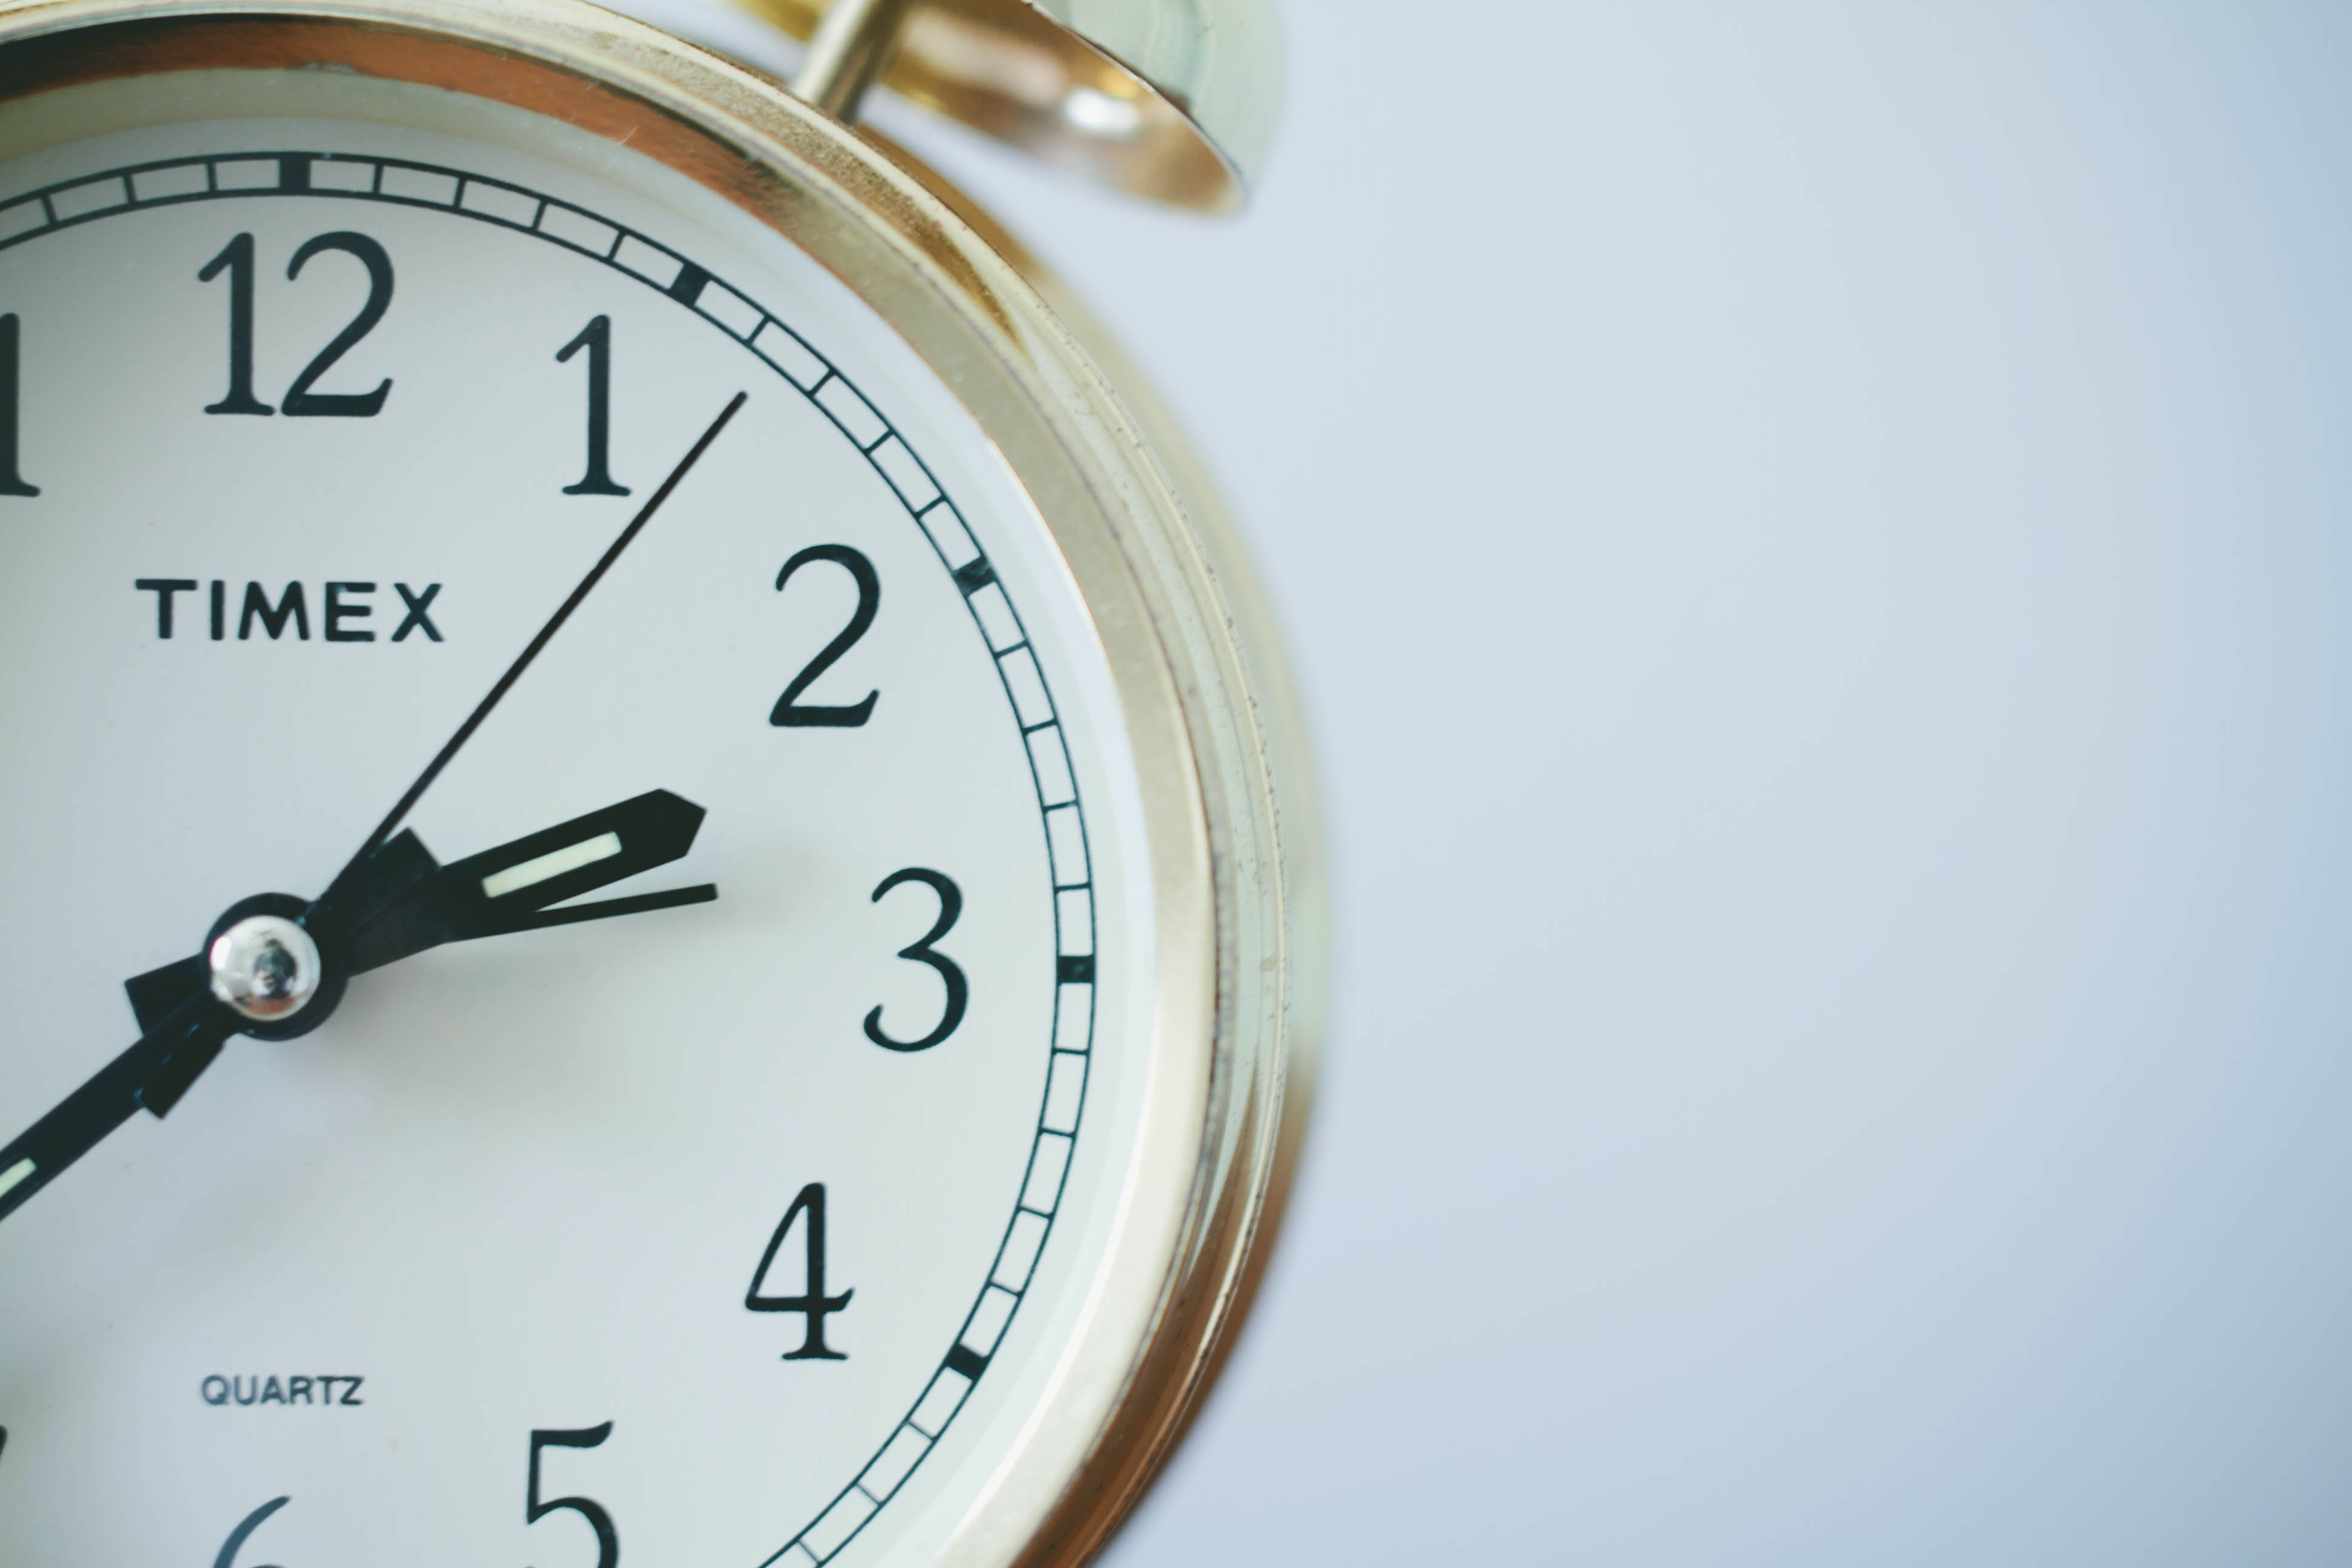 Quality Time vs. Quantity Time